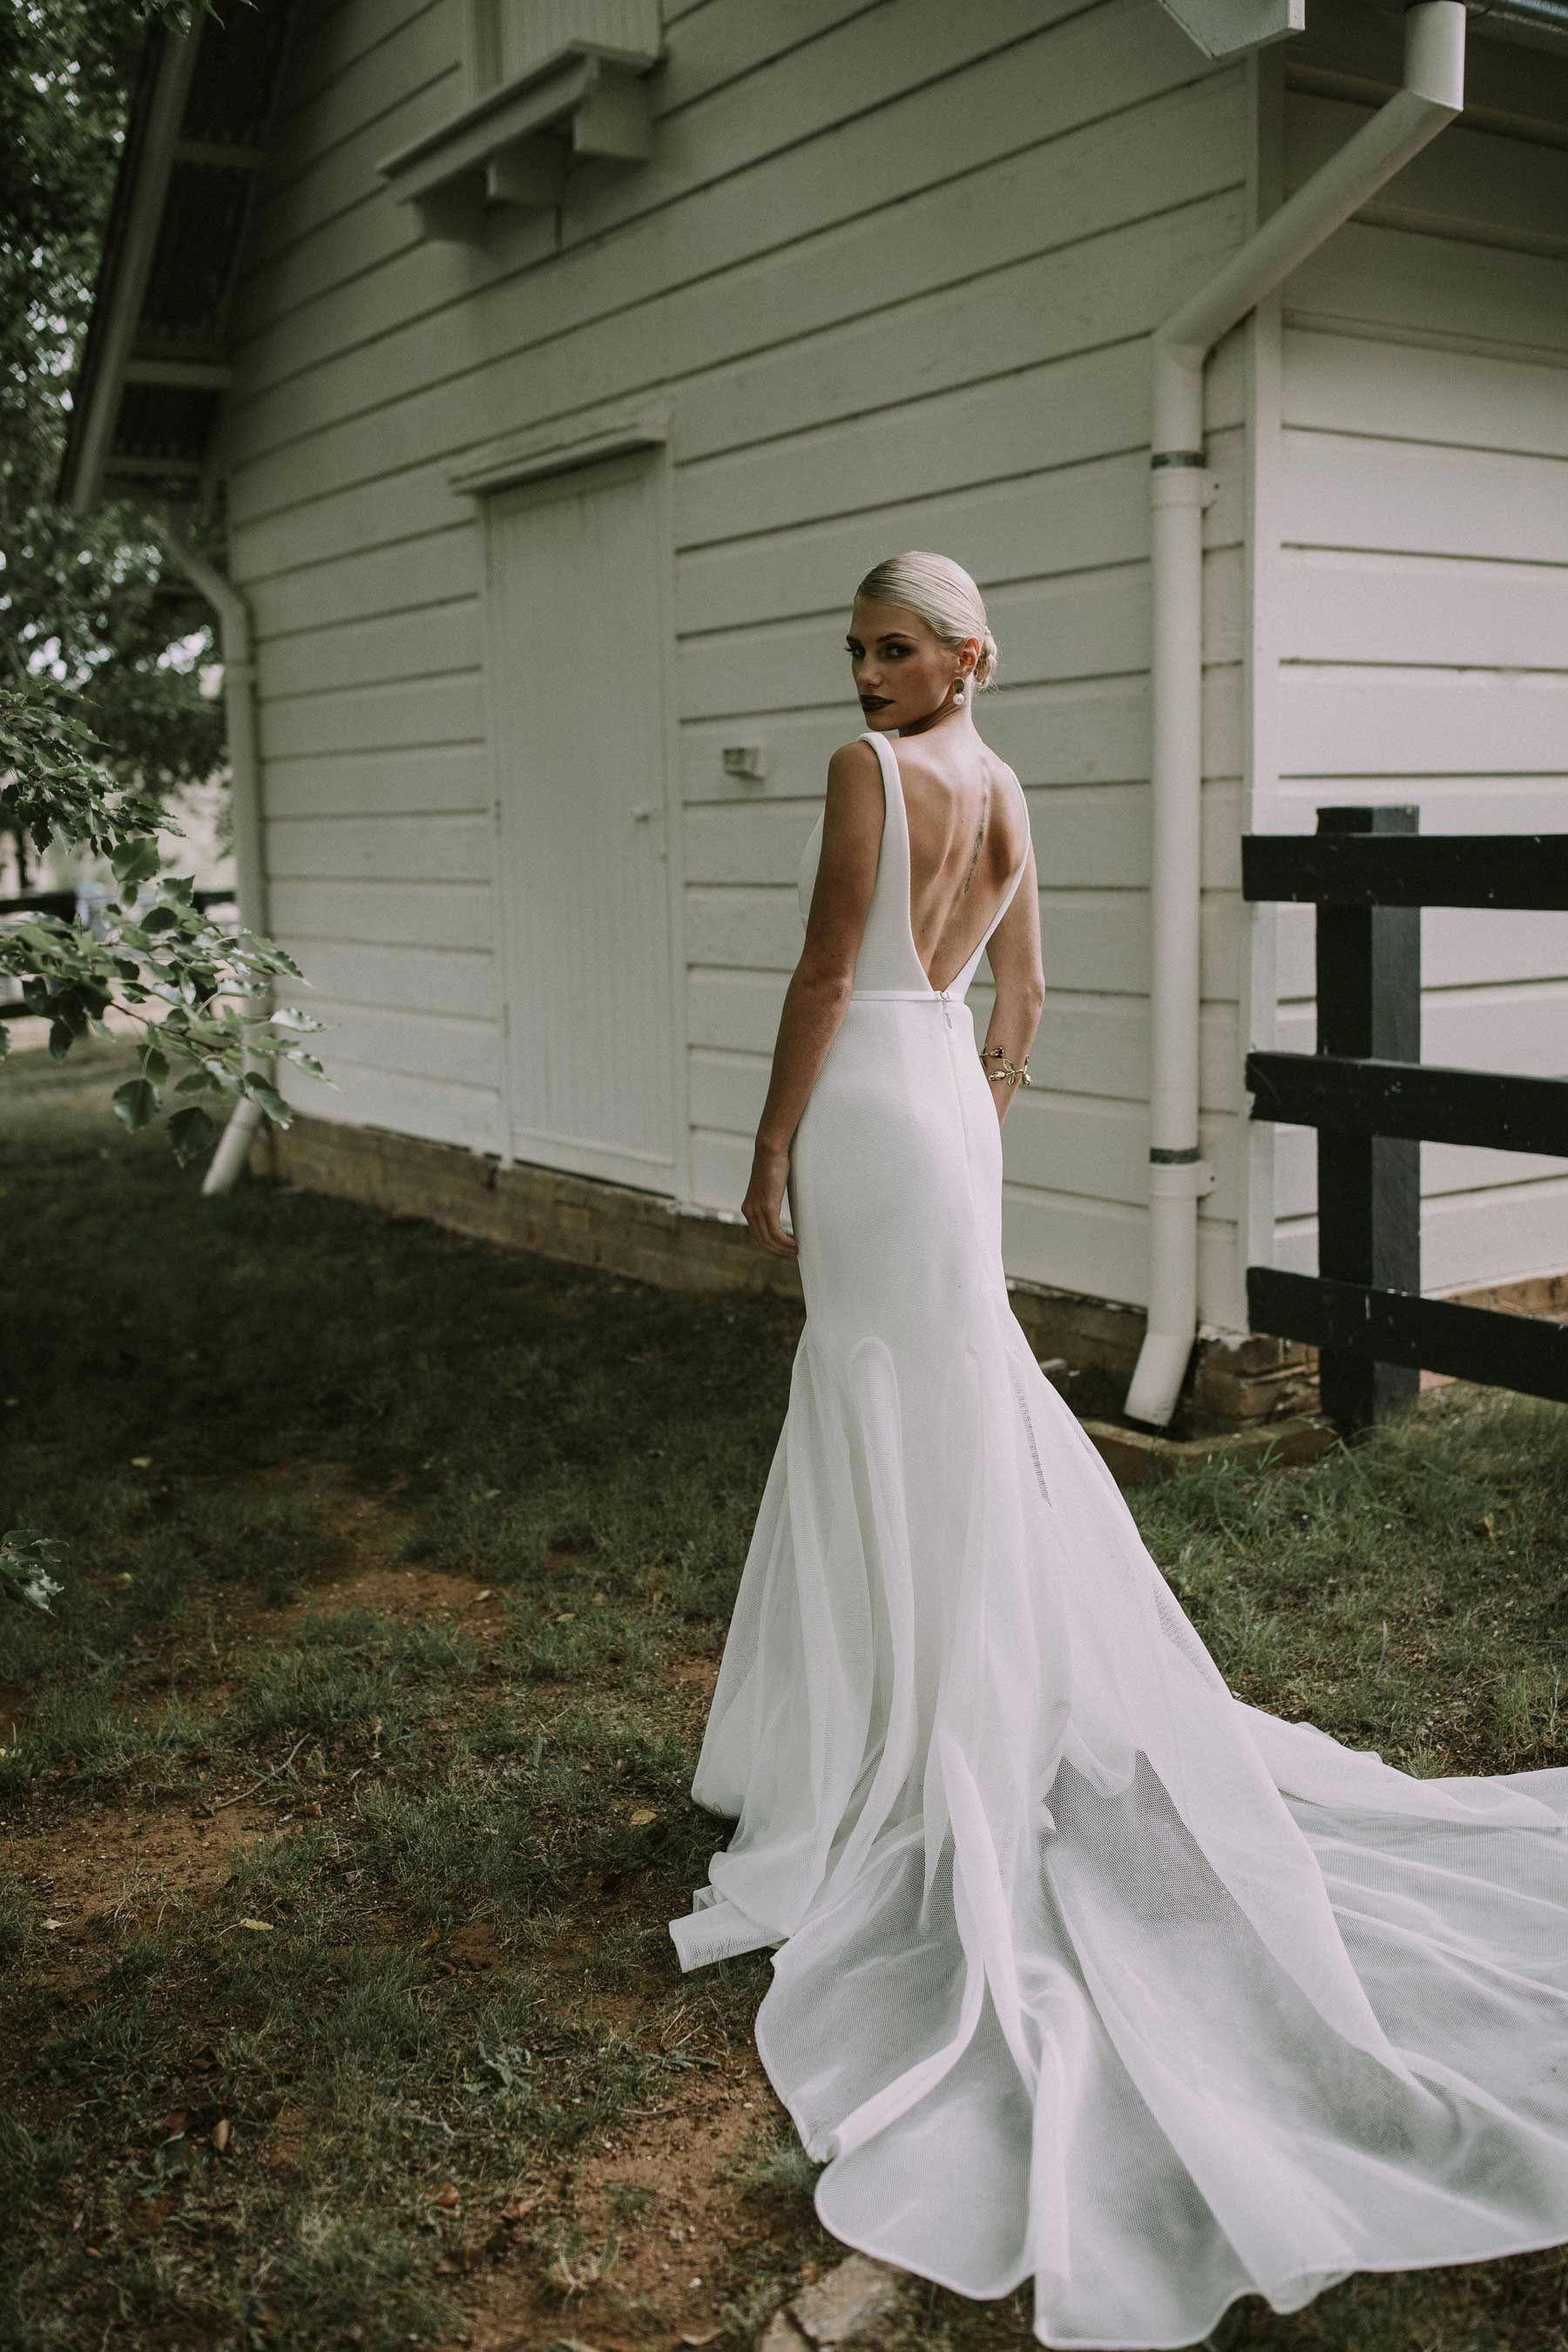 Custom Wedding Dresses And Bespoke Bridal Attire African Wedding Attire Wedding Dress Inspiration Custom Wedding Dress [ 1242 x 1080 Pixel ]